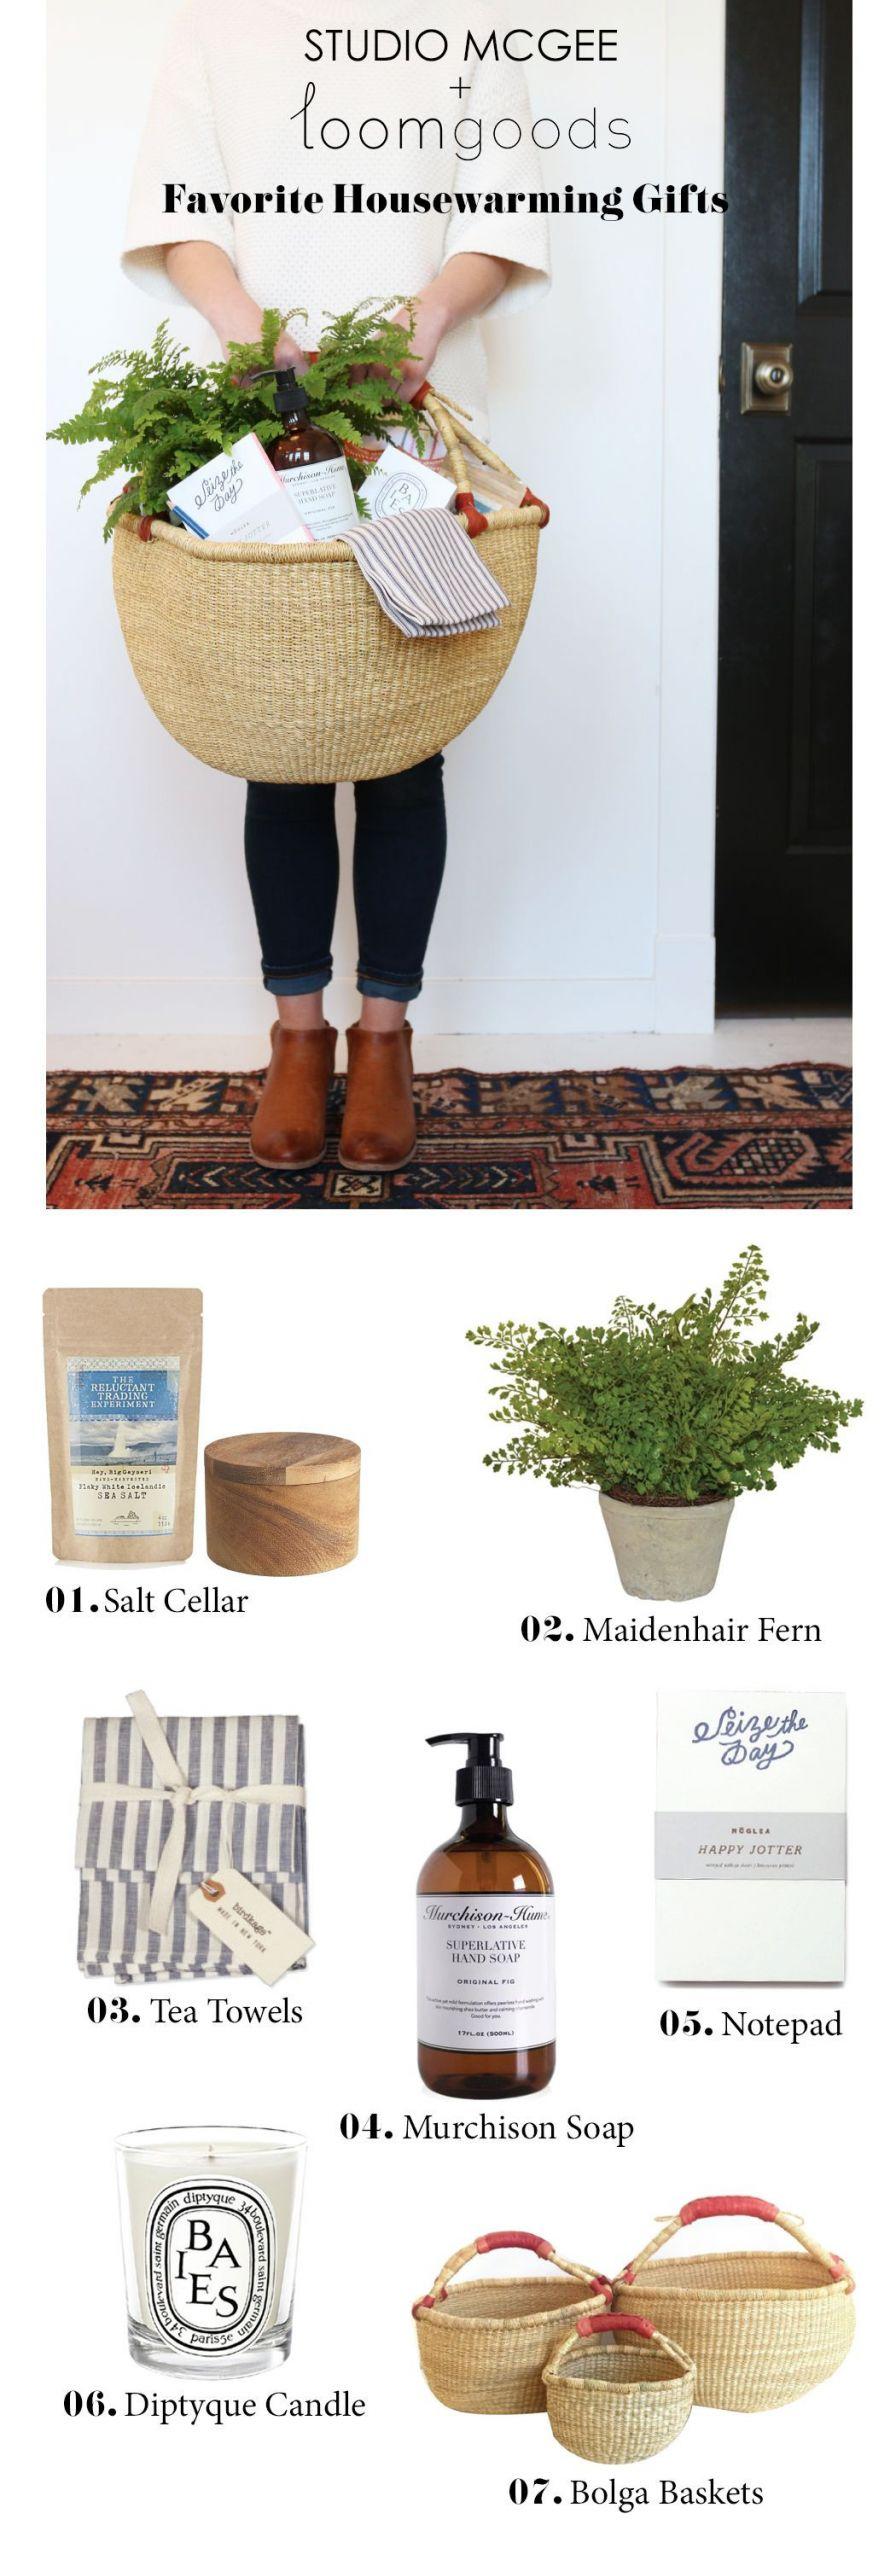 Best Housewarming Gift Ideas  Favorite Housewarming Gifts